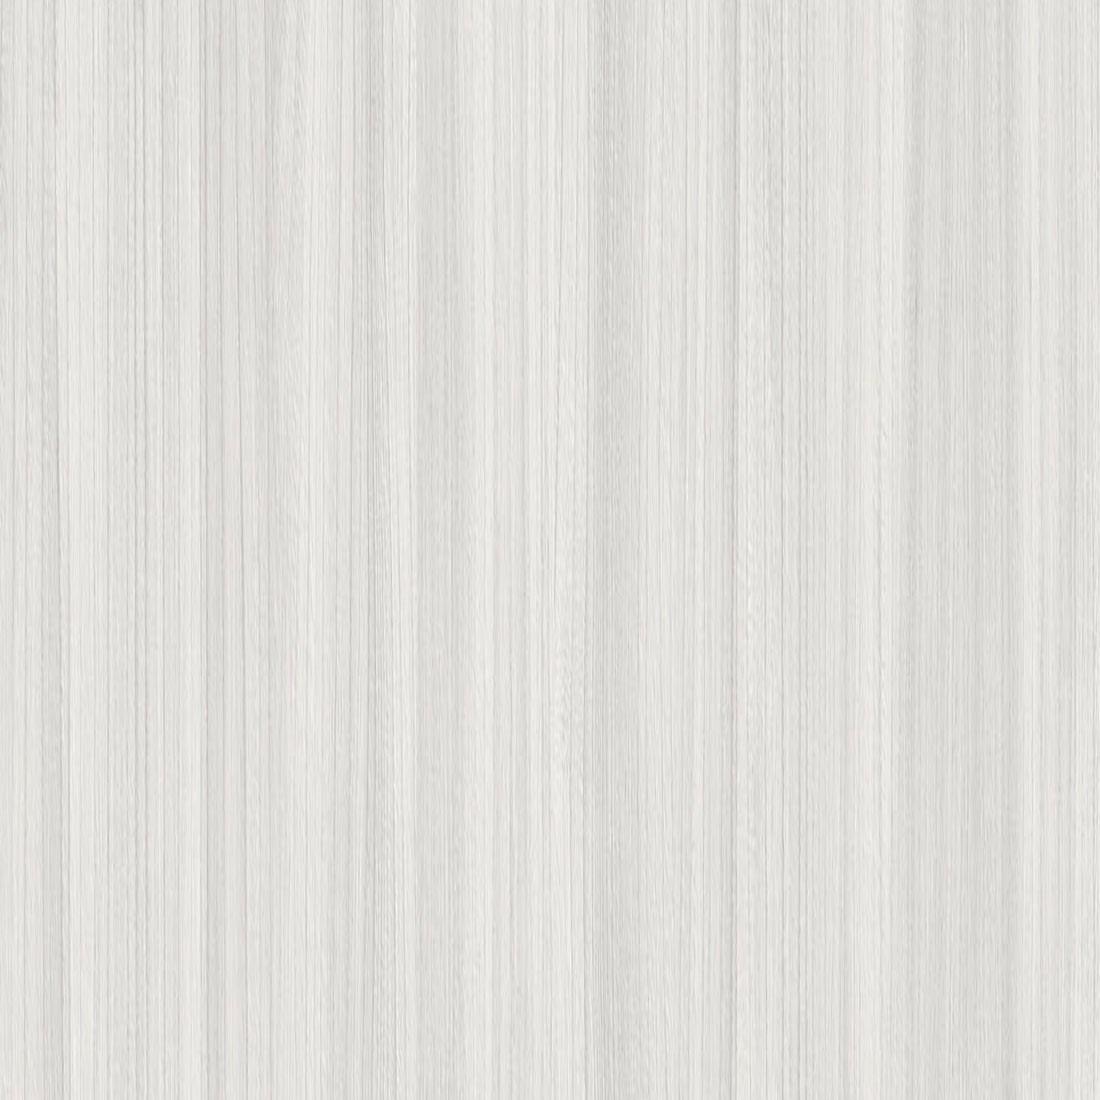 Papel De Parede Tábuas De Deck Externoanti Mofo R$ 59 95 em Mercado  #6F695D 1100x1100